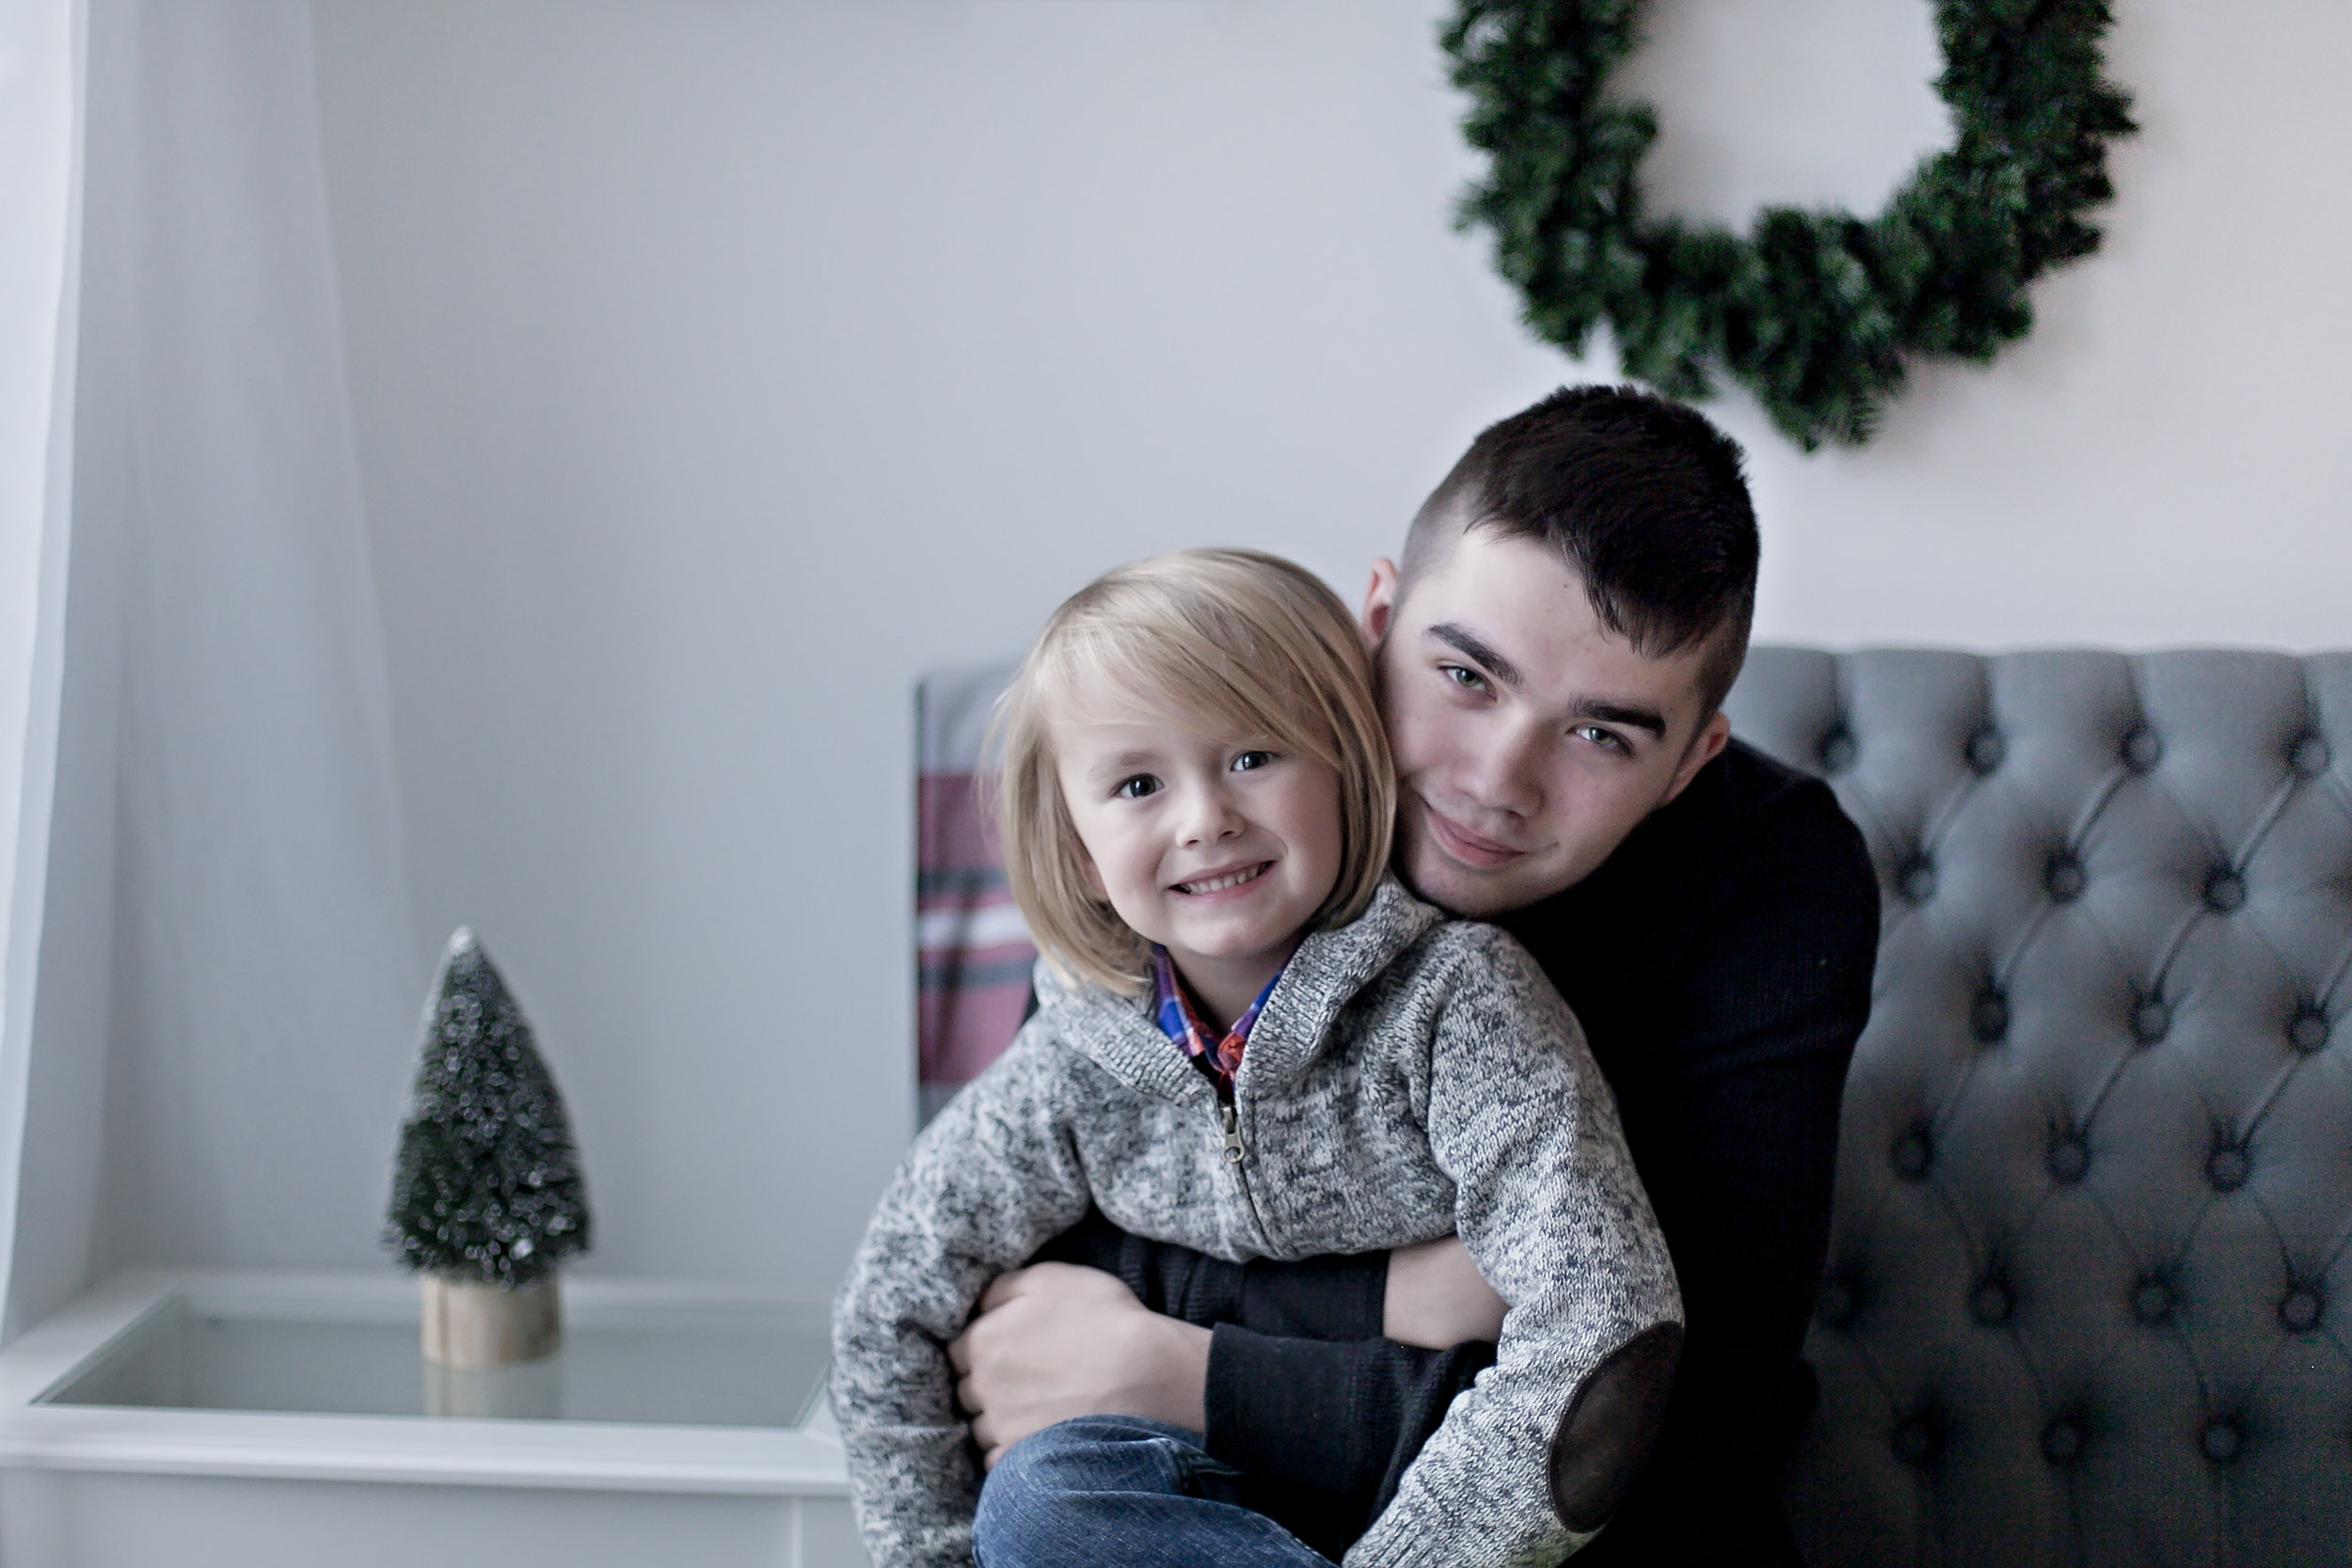 Brothers_Christmas_Evergreen_Portrait_Photographer